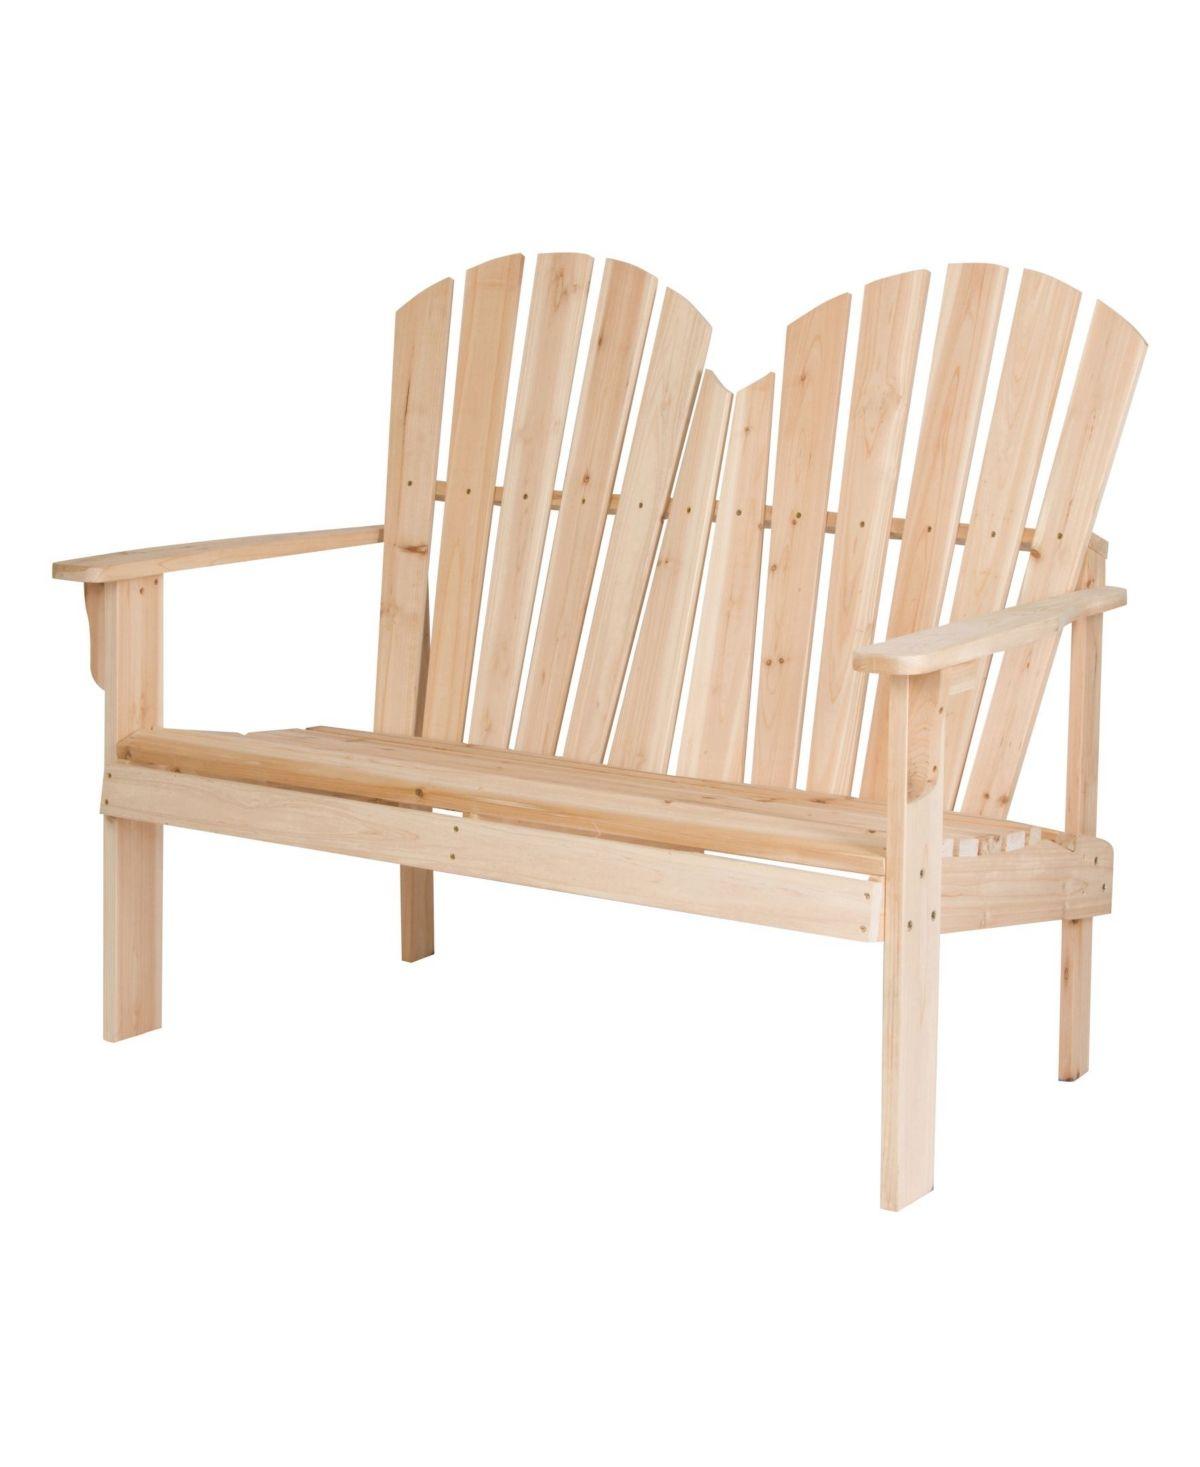 garden love seat on rockport loveseat natural wooden garden benches outdoor loveseat cedar bench wooden garden benches outdoor loveseat